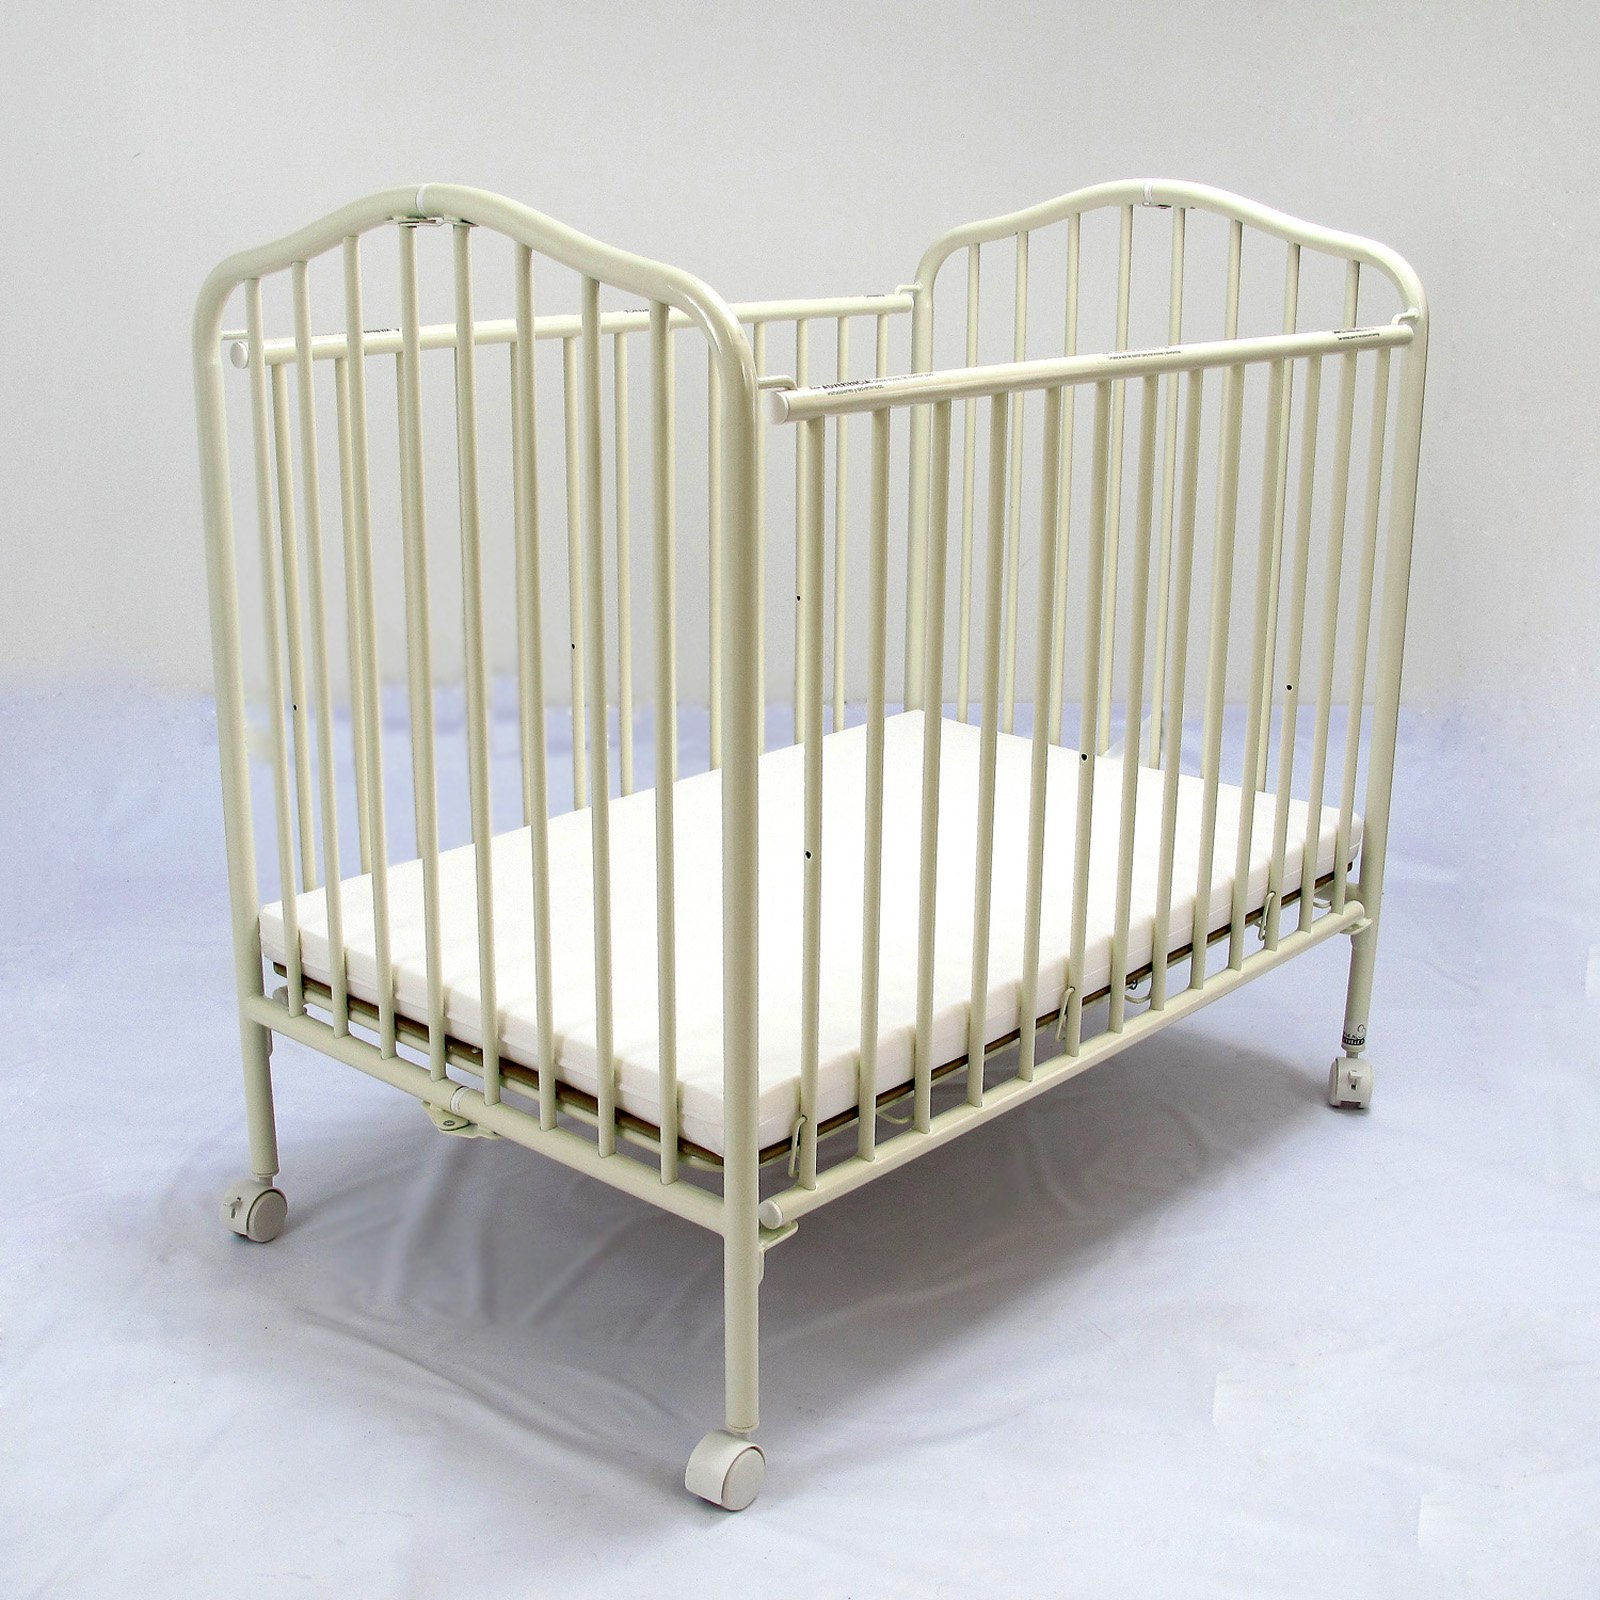 LA Baby Compact Metal Folding Crib